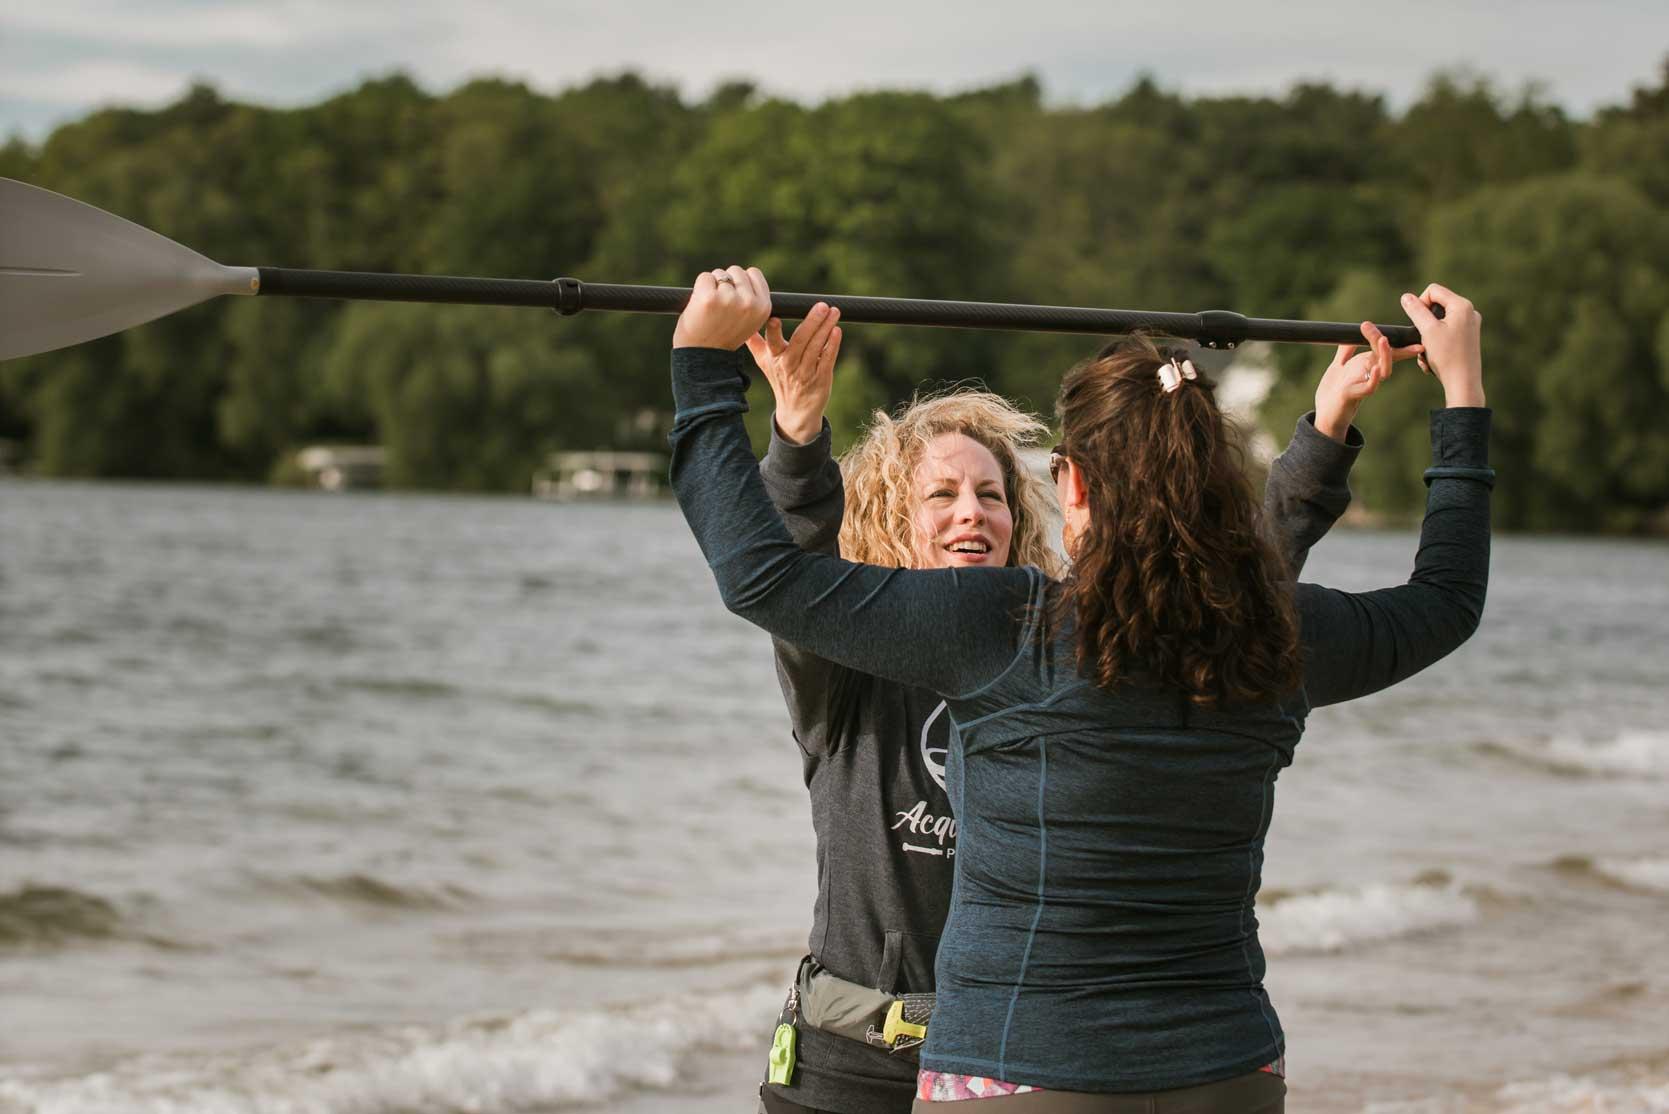 Acqua Dolce Paddle Holli instructing student holding paddle above head